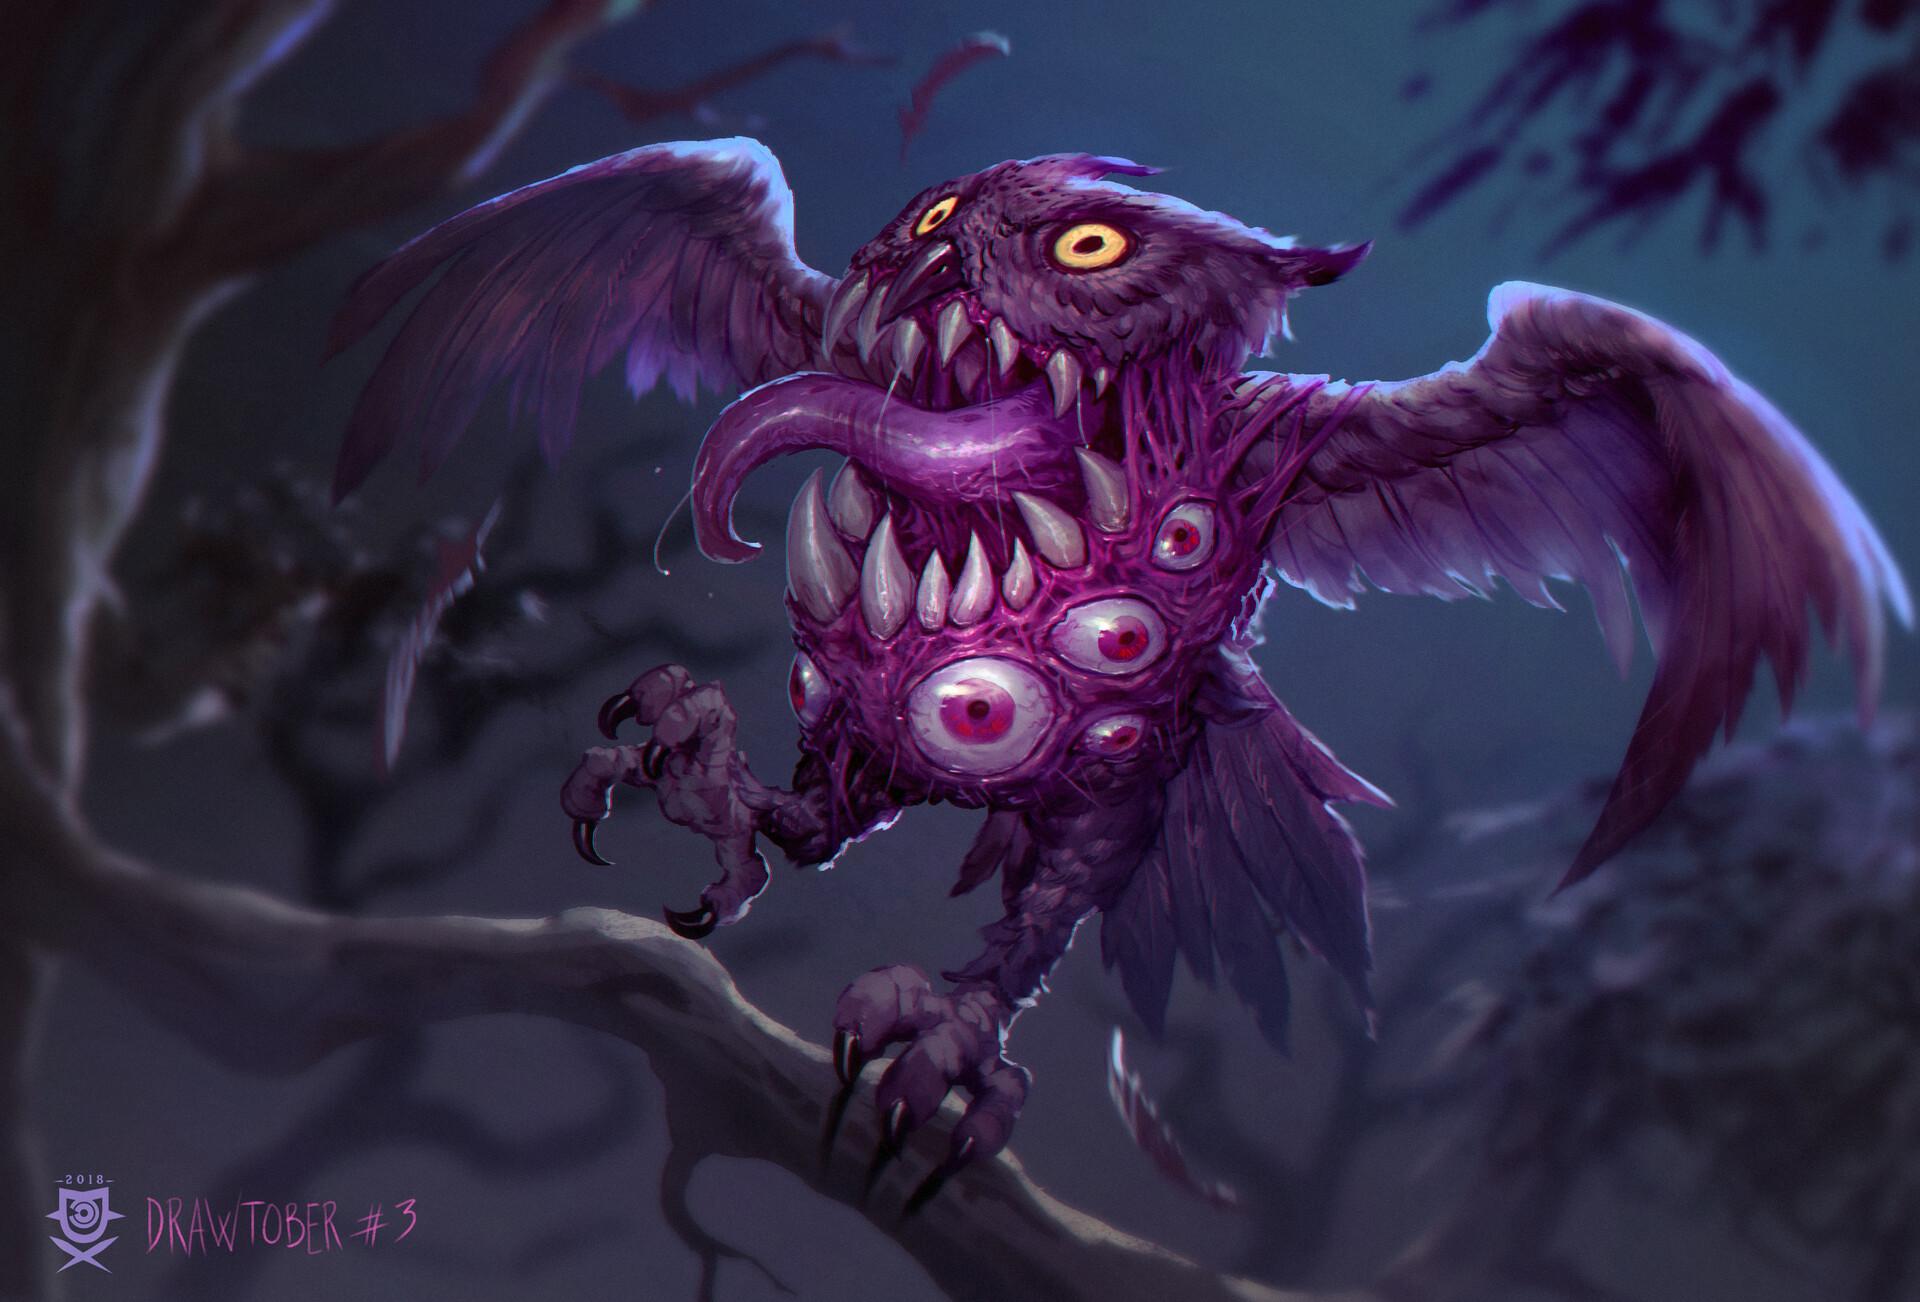 Thomas bourdon night owl